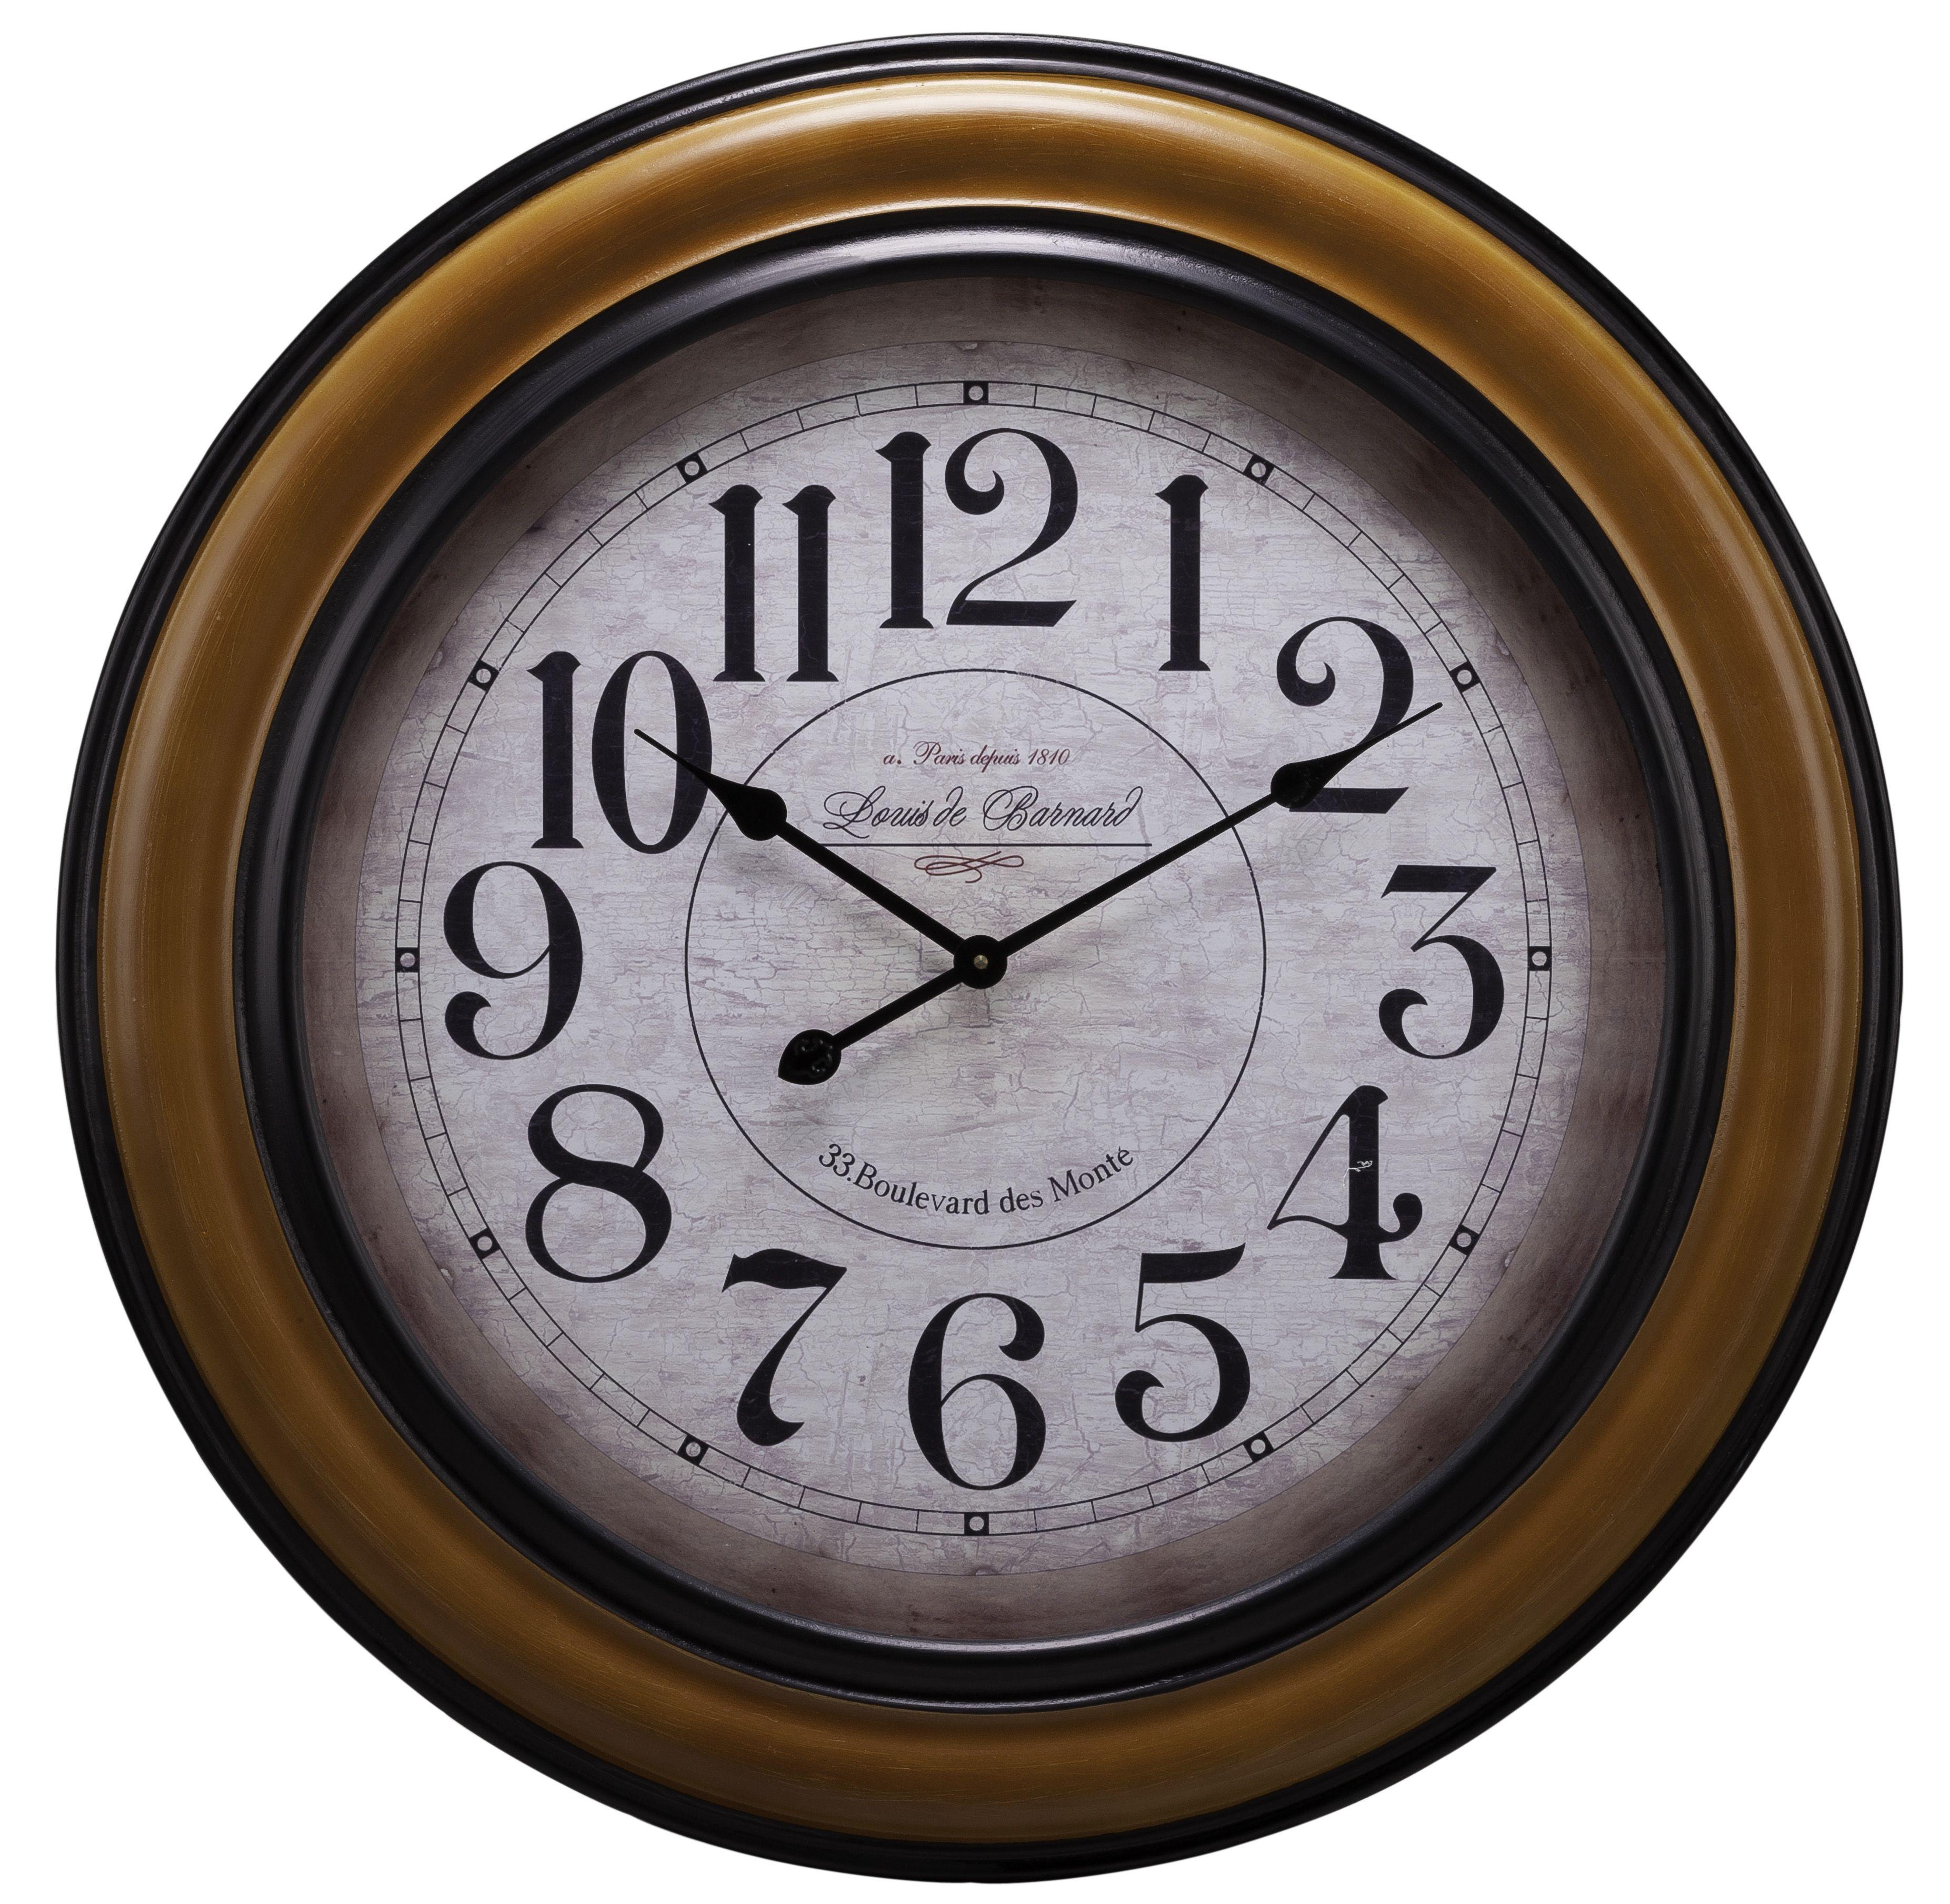 Cooper Classics Payton Clock 4815 In Stock Now Http Clocksmarketplace Com Products Cooper Classics Payton Wall Clock Oversized Wall Clock Big Wall Clocks